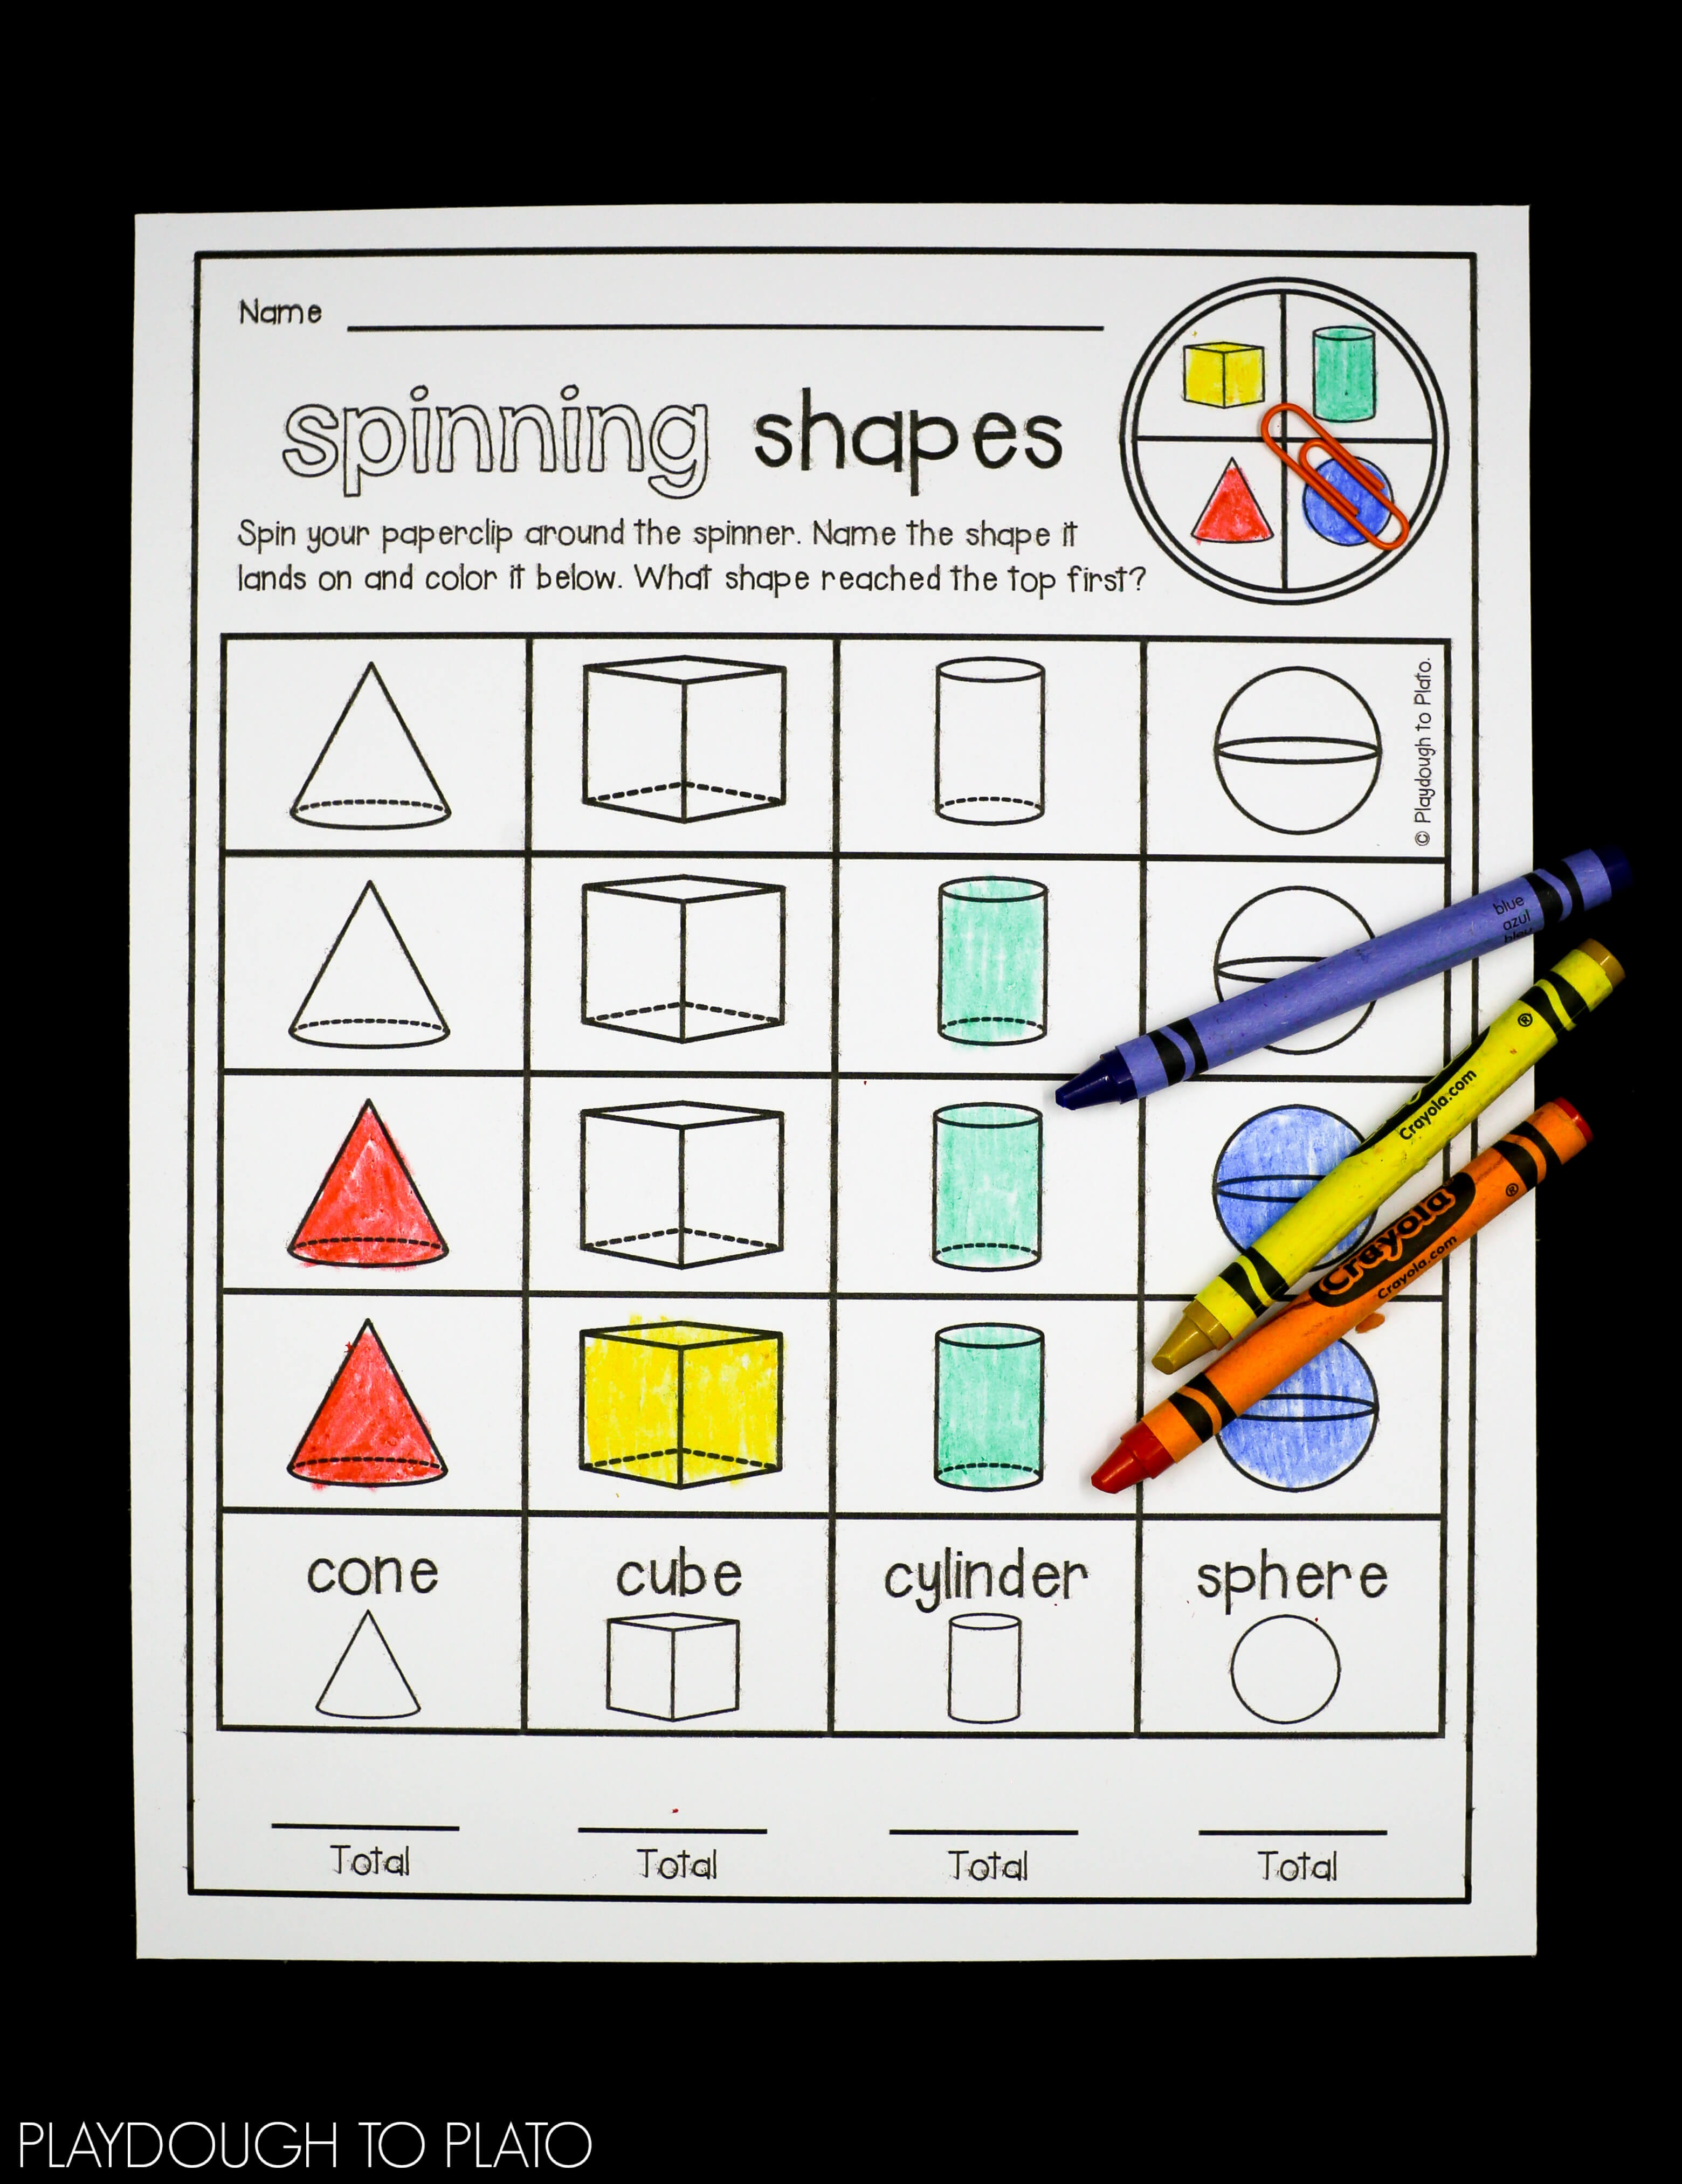 3D Shape Activities - Playdough To Plato - 3D Shape Bingo Free Printable